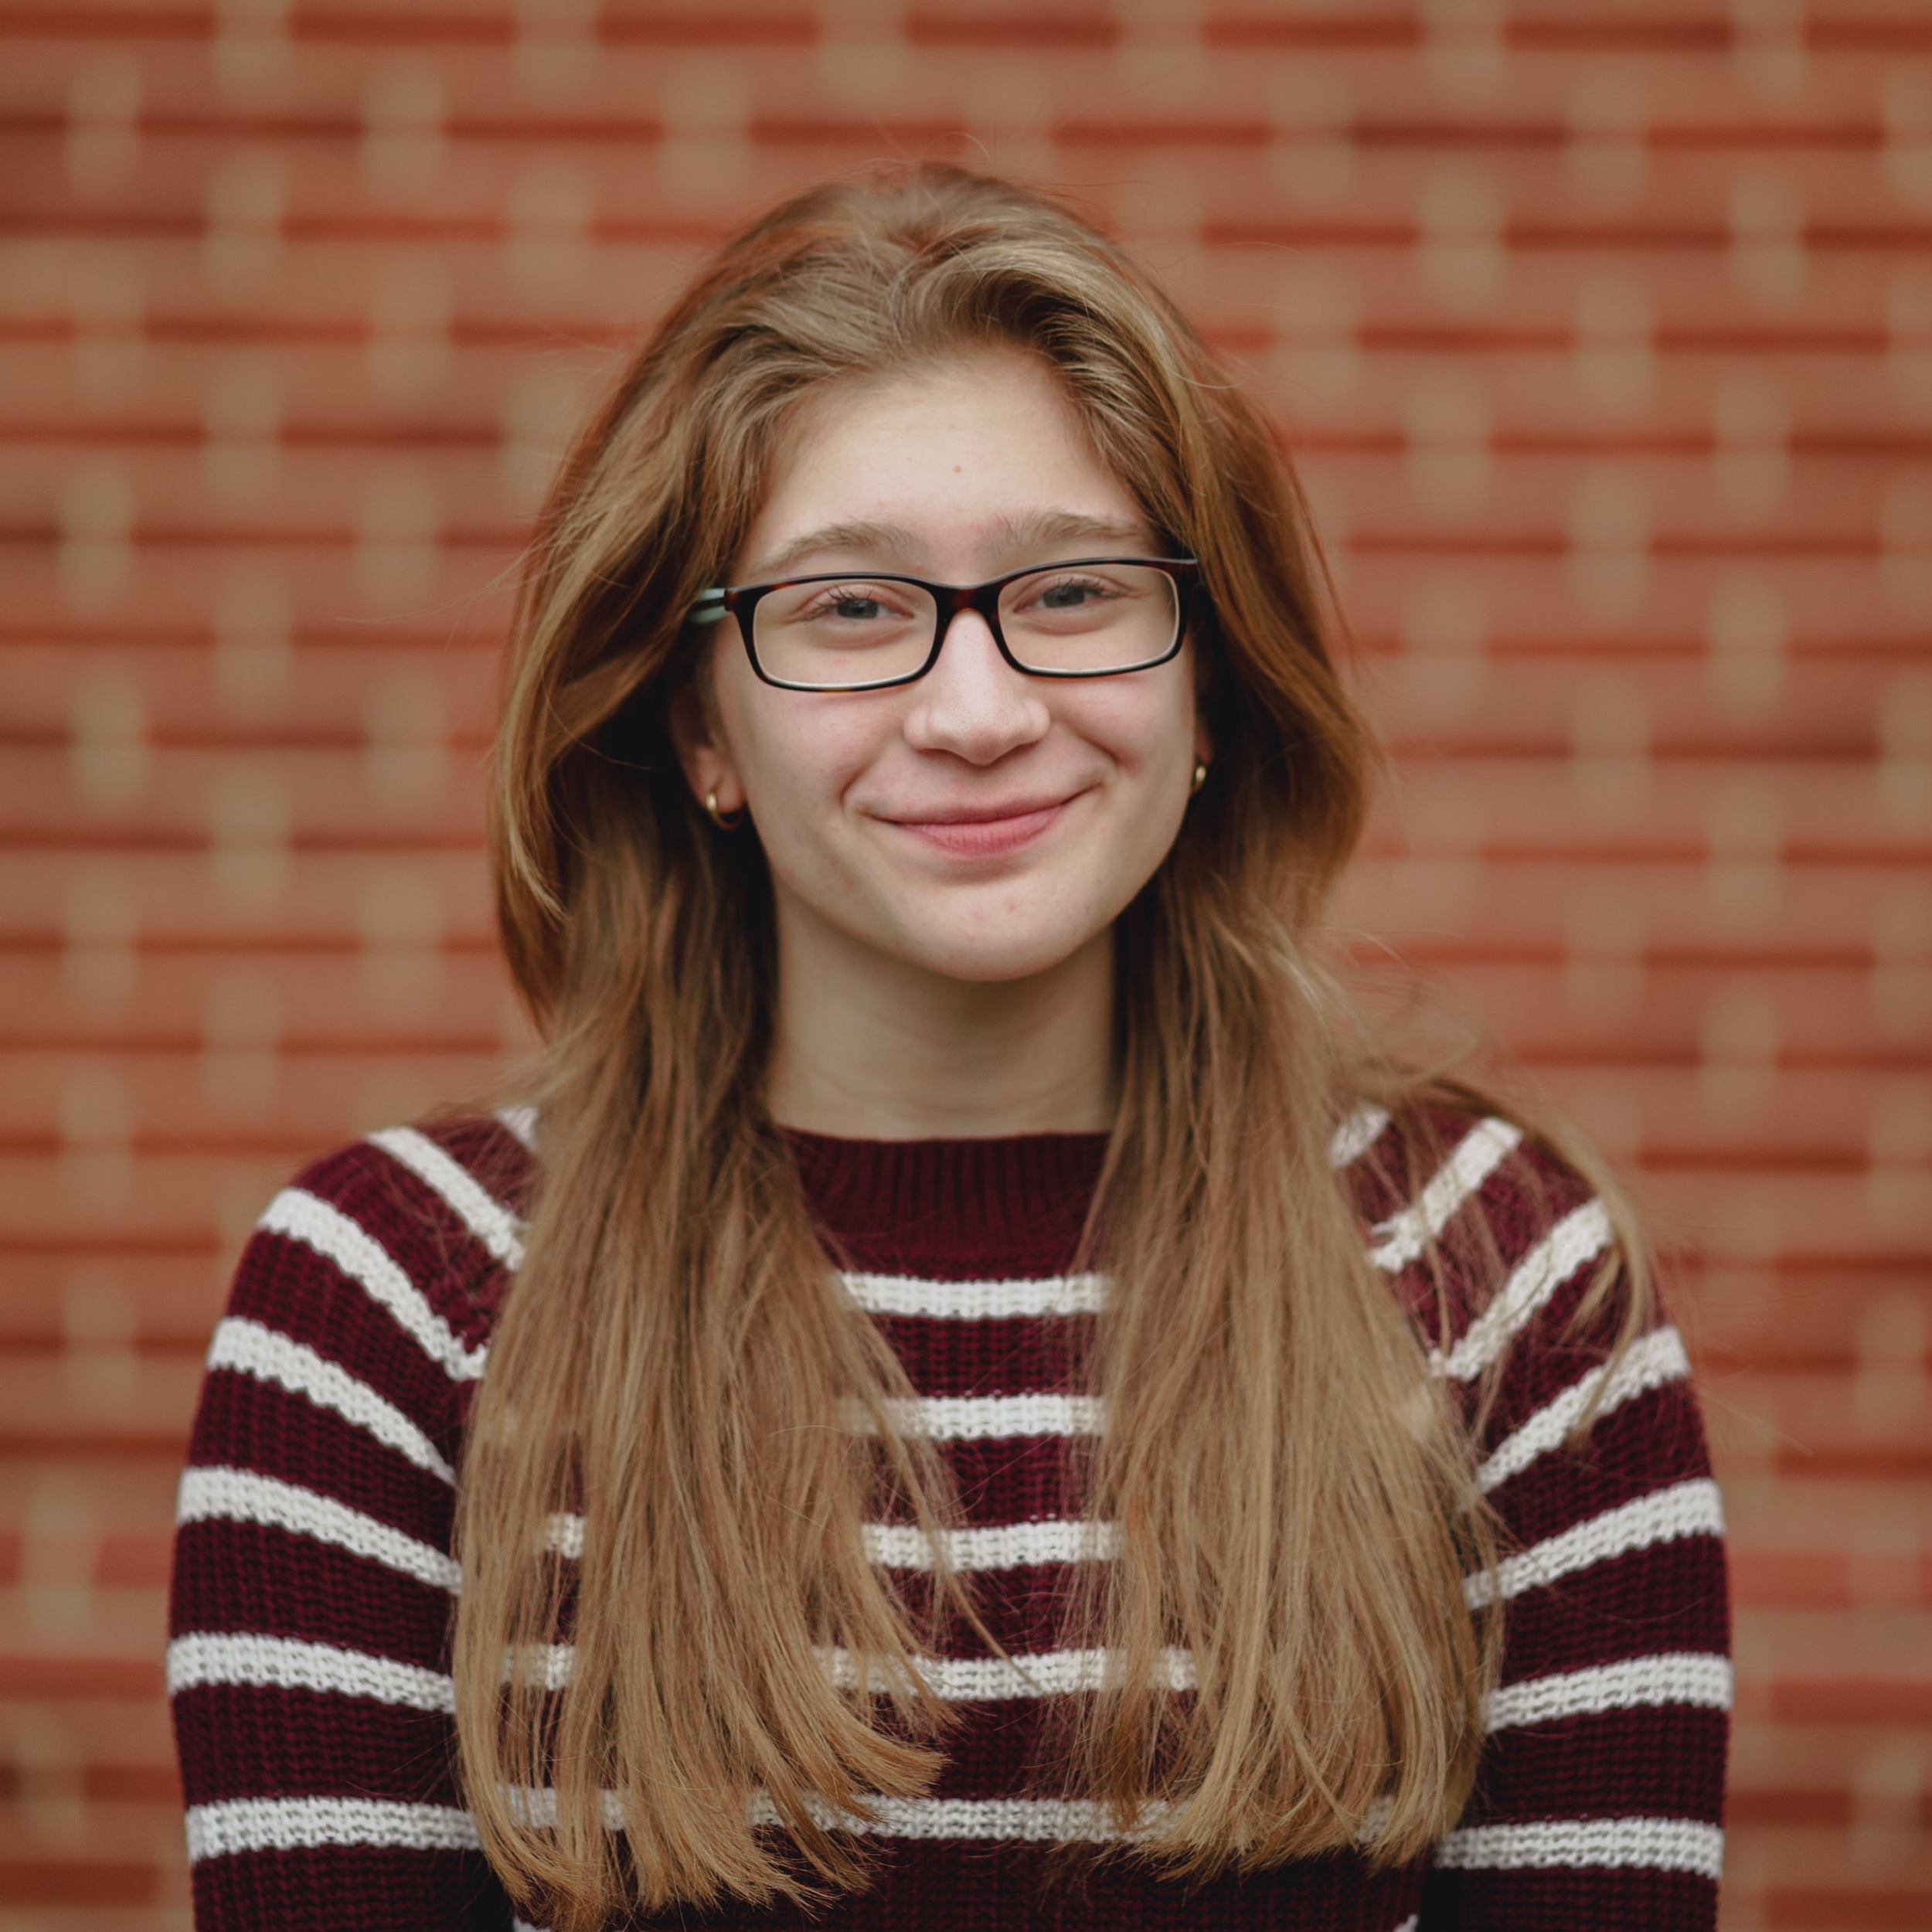 Millie VazquezWorship Manager Intern - mvazquez@fbcwoodbridge.org